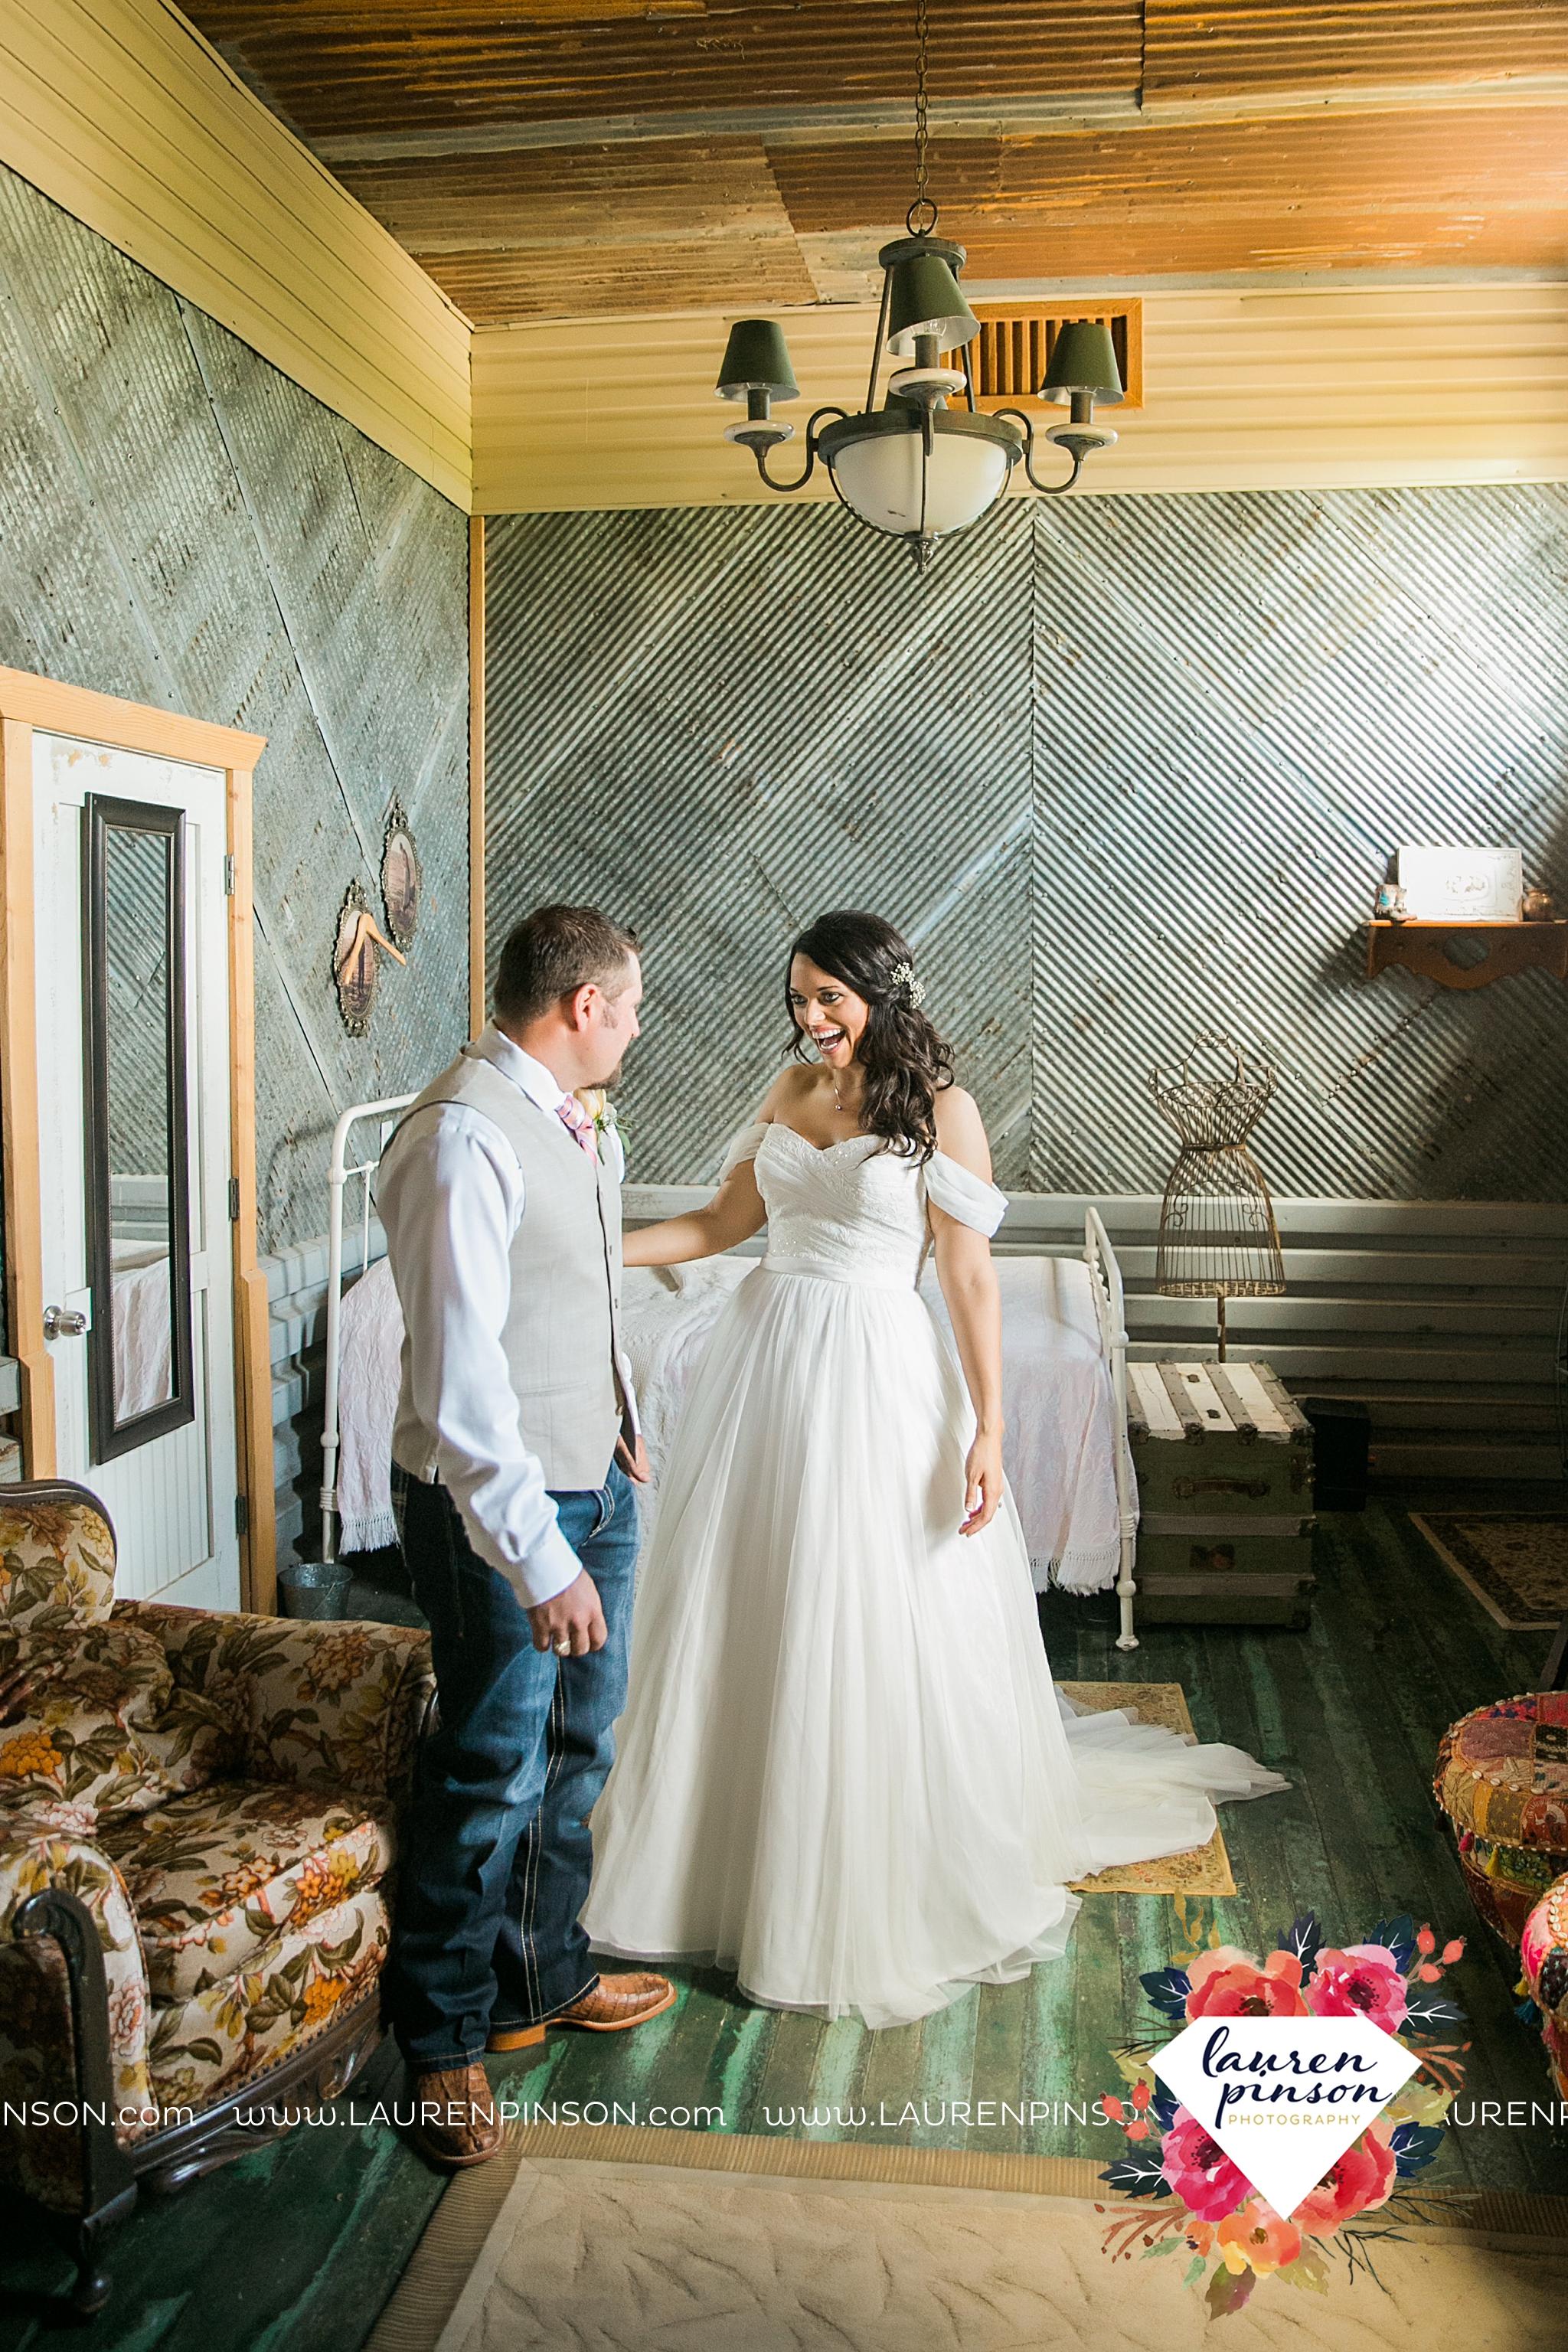 jones-barn-willow-creek-ranch-wedding-in-cleburne-texas-fort-worth-dfw-wichita-falls-wedding-photography_3198.jpg